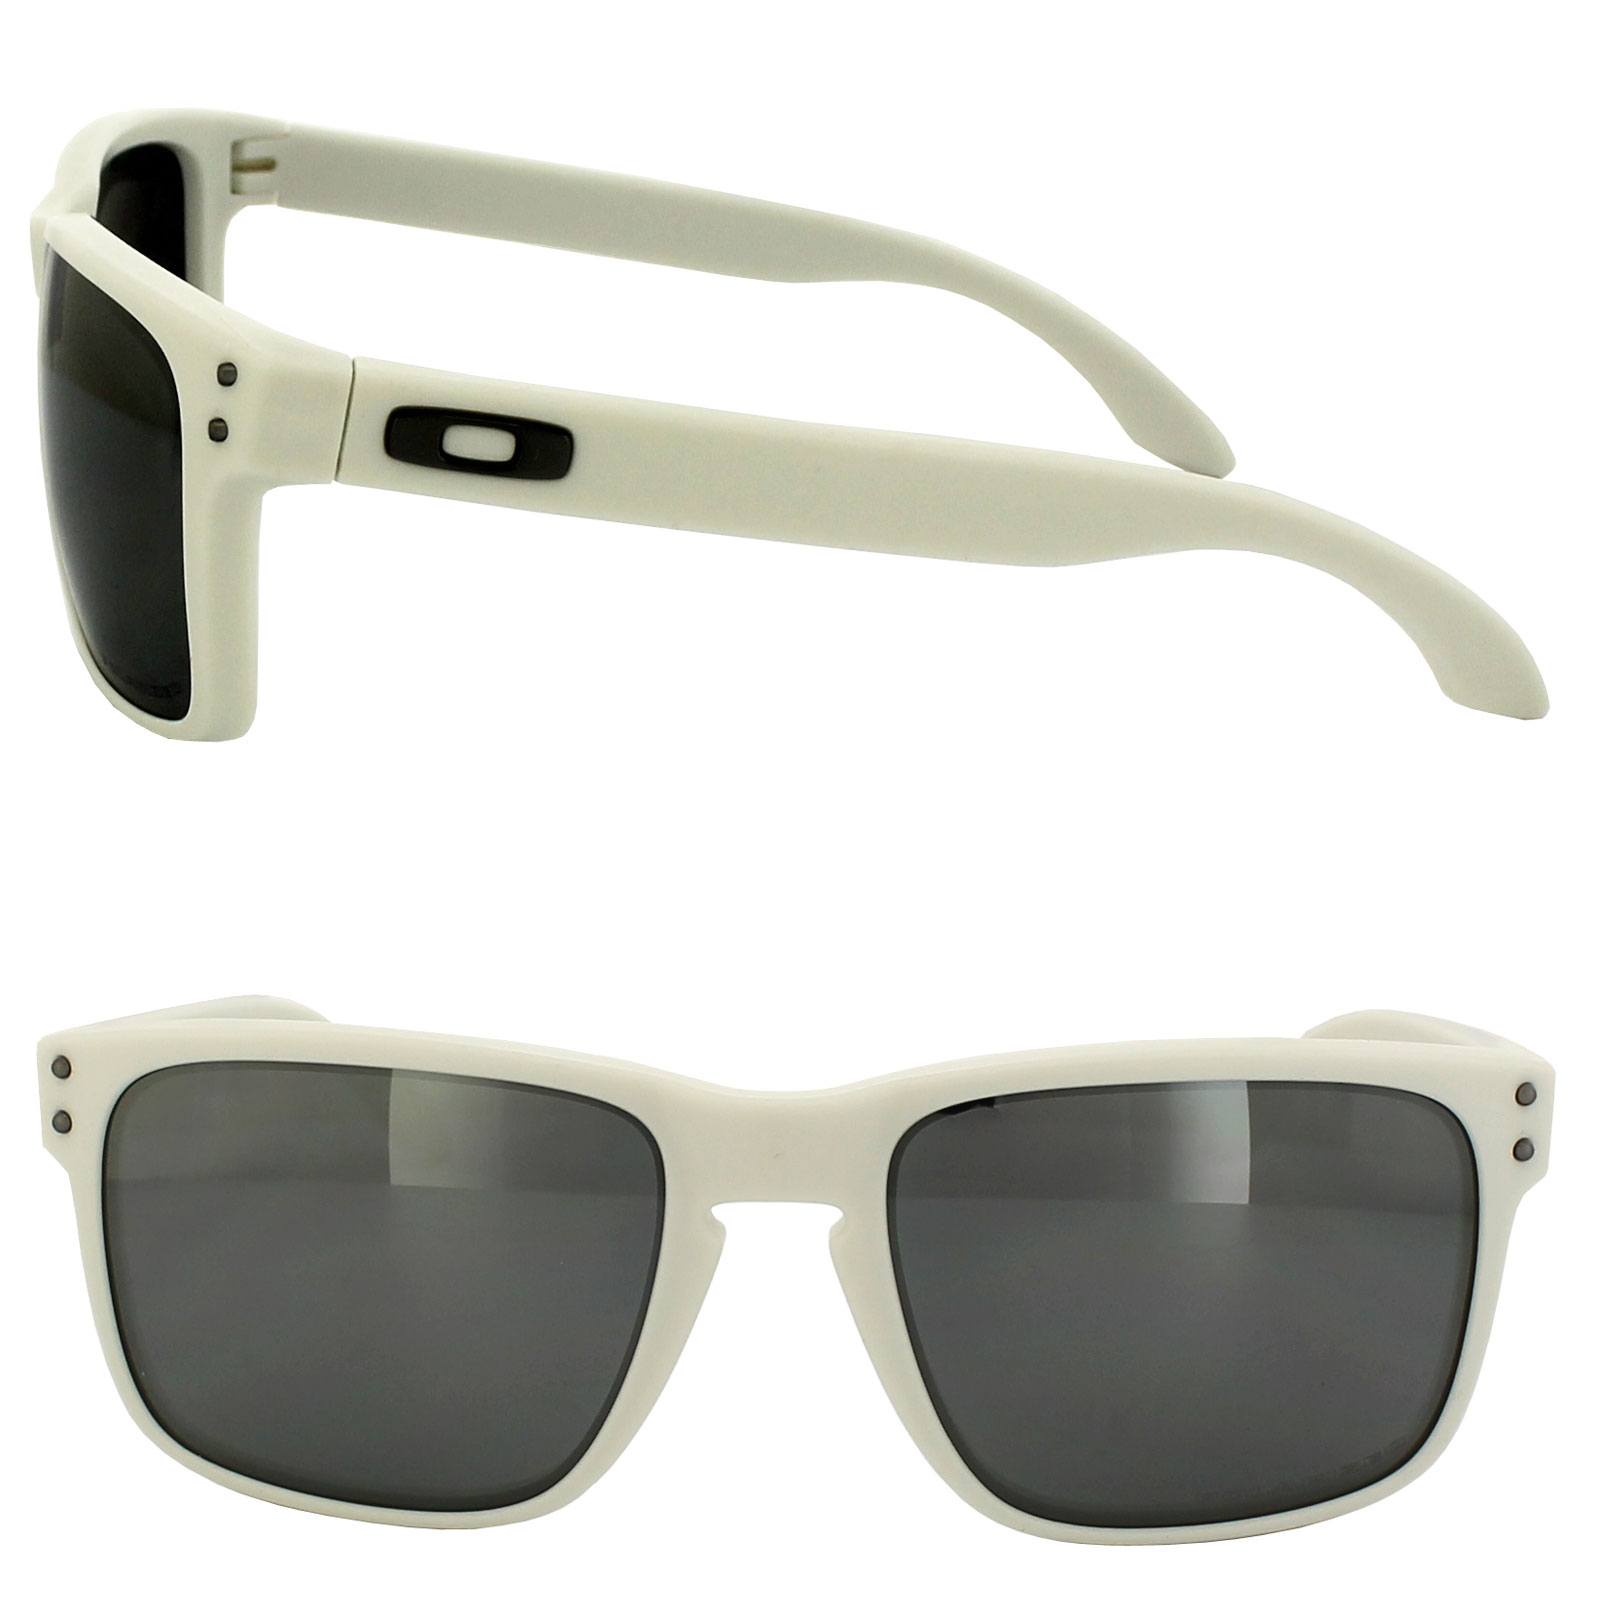 discount oakley holbrook sunglasses mop2  Oakley Sunglasses Holbrook 9102-71 Matt Cloud White Black Iridium  Polarized Thumbnail 2